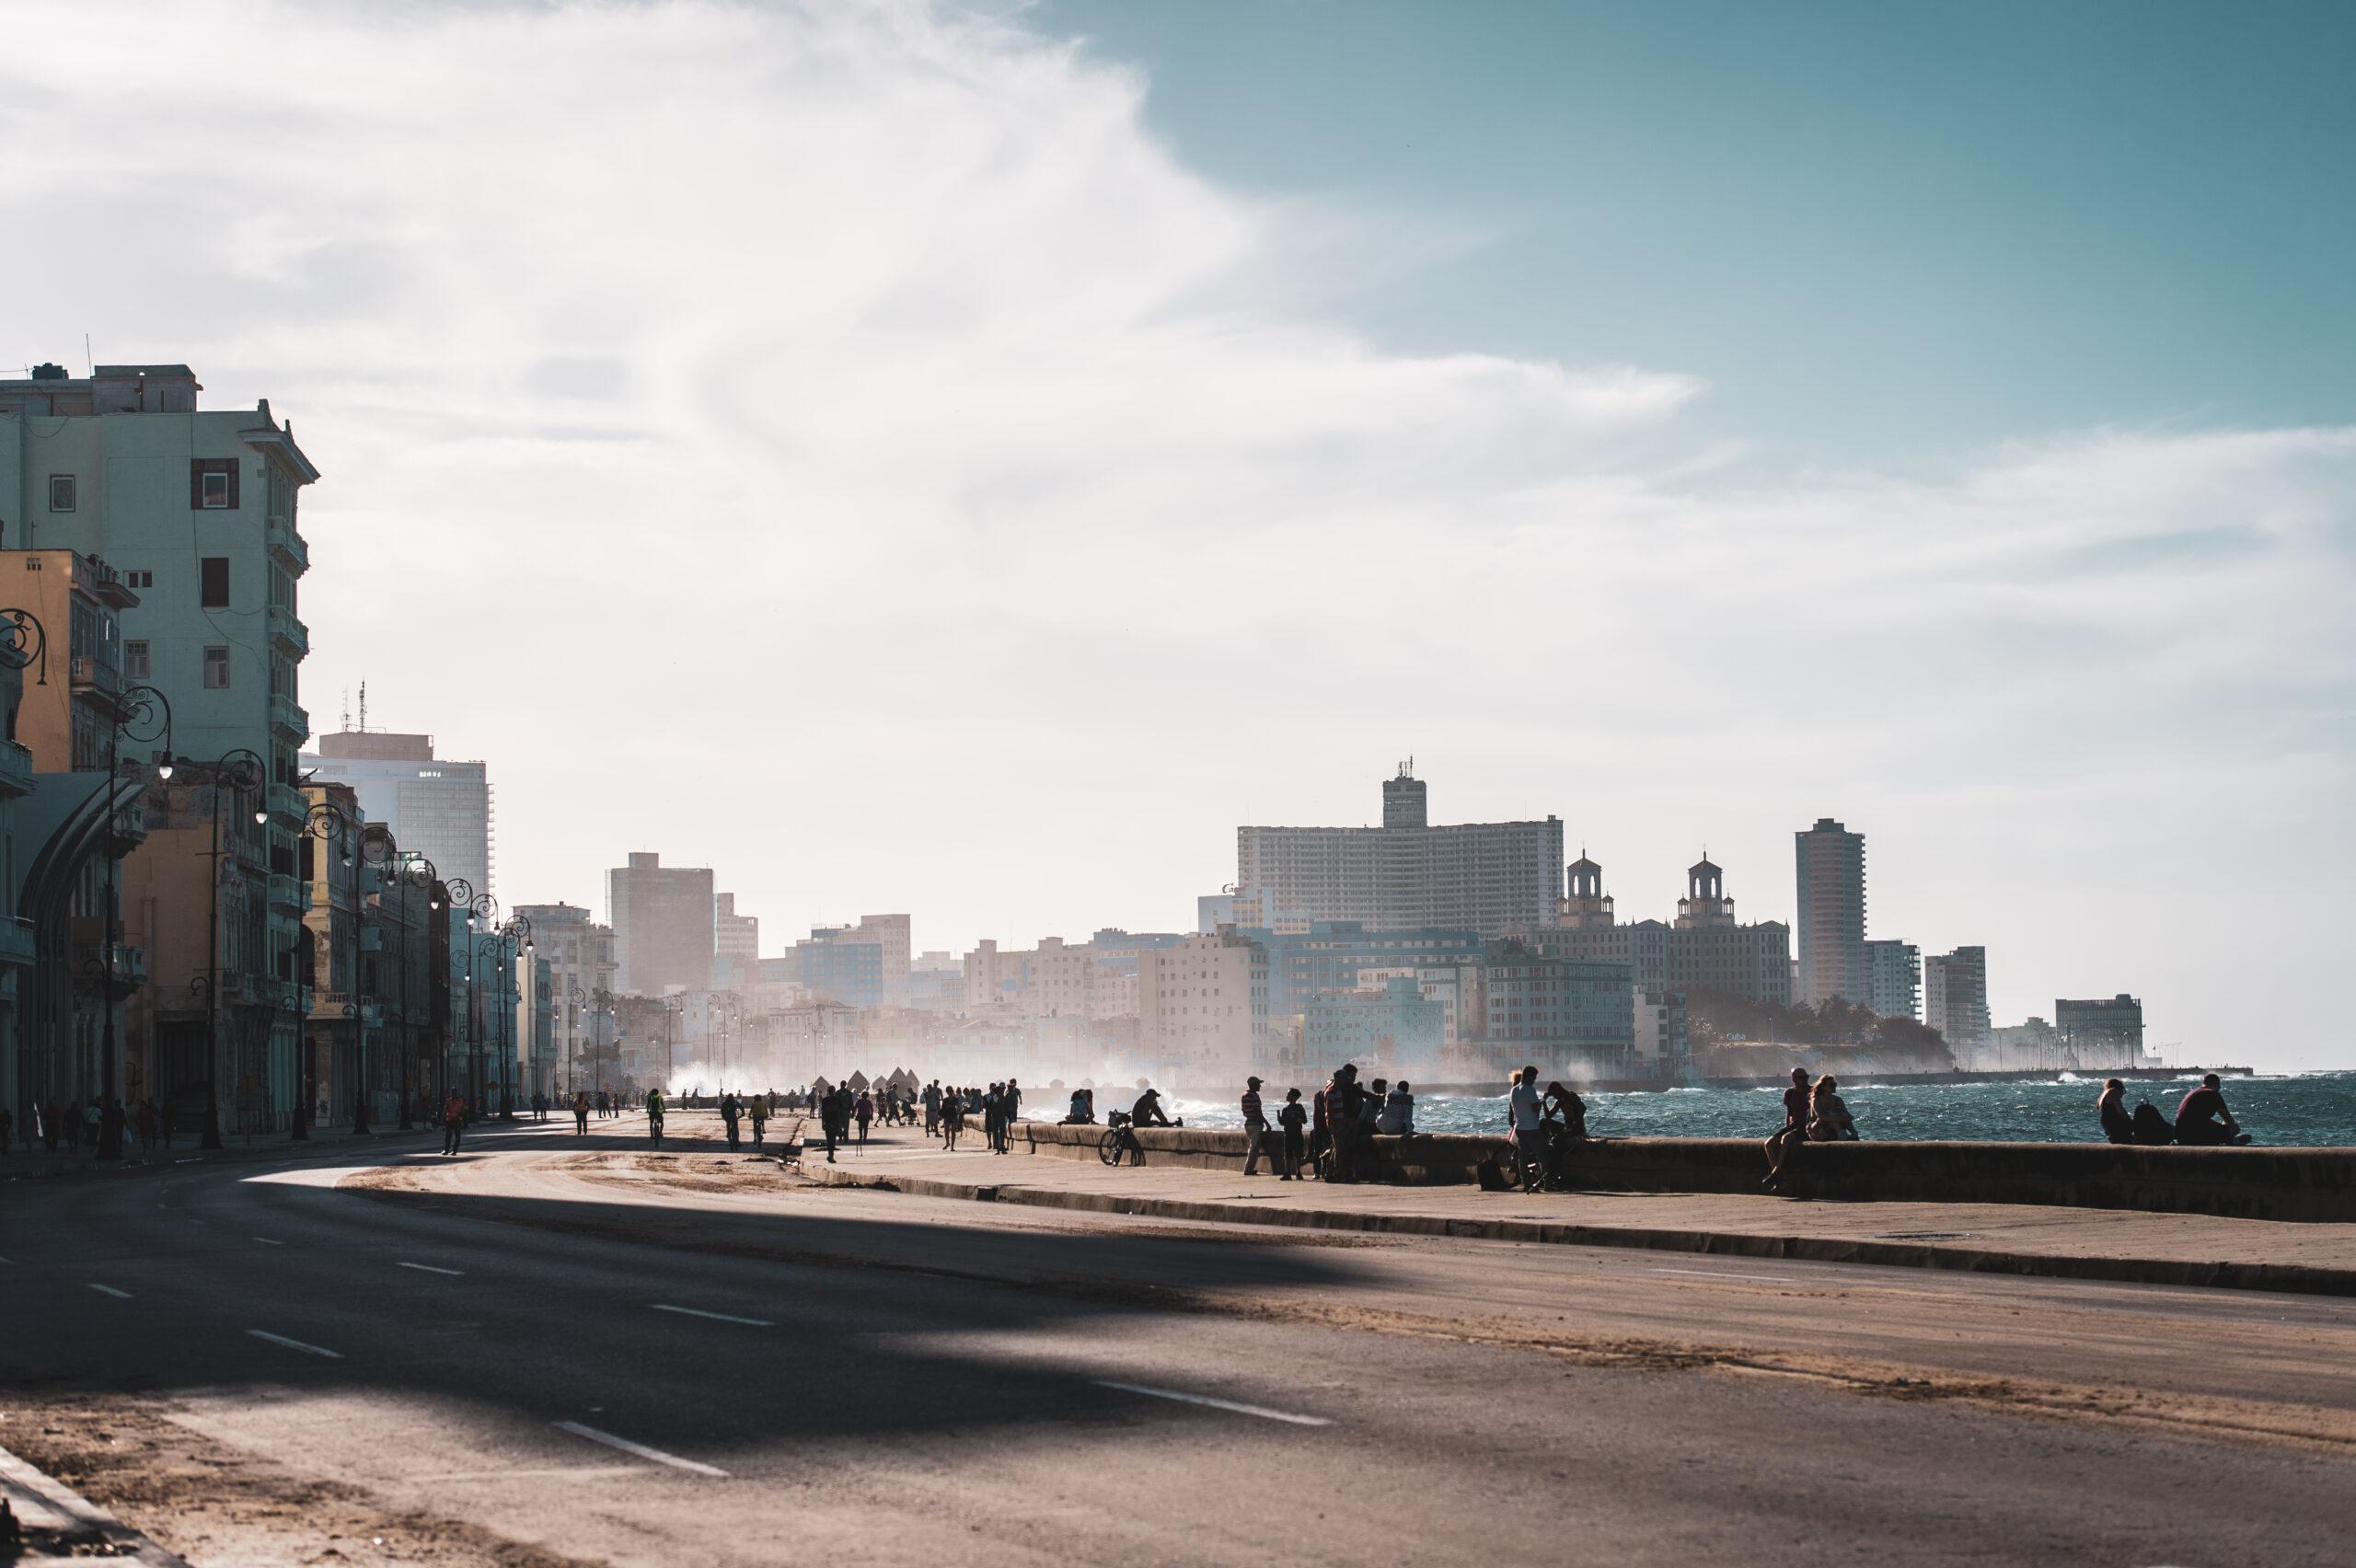 Photographe : Le temps Cubain Home